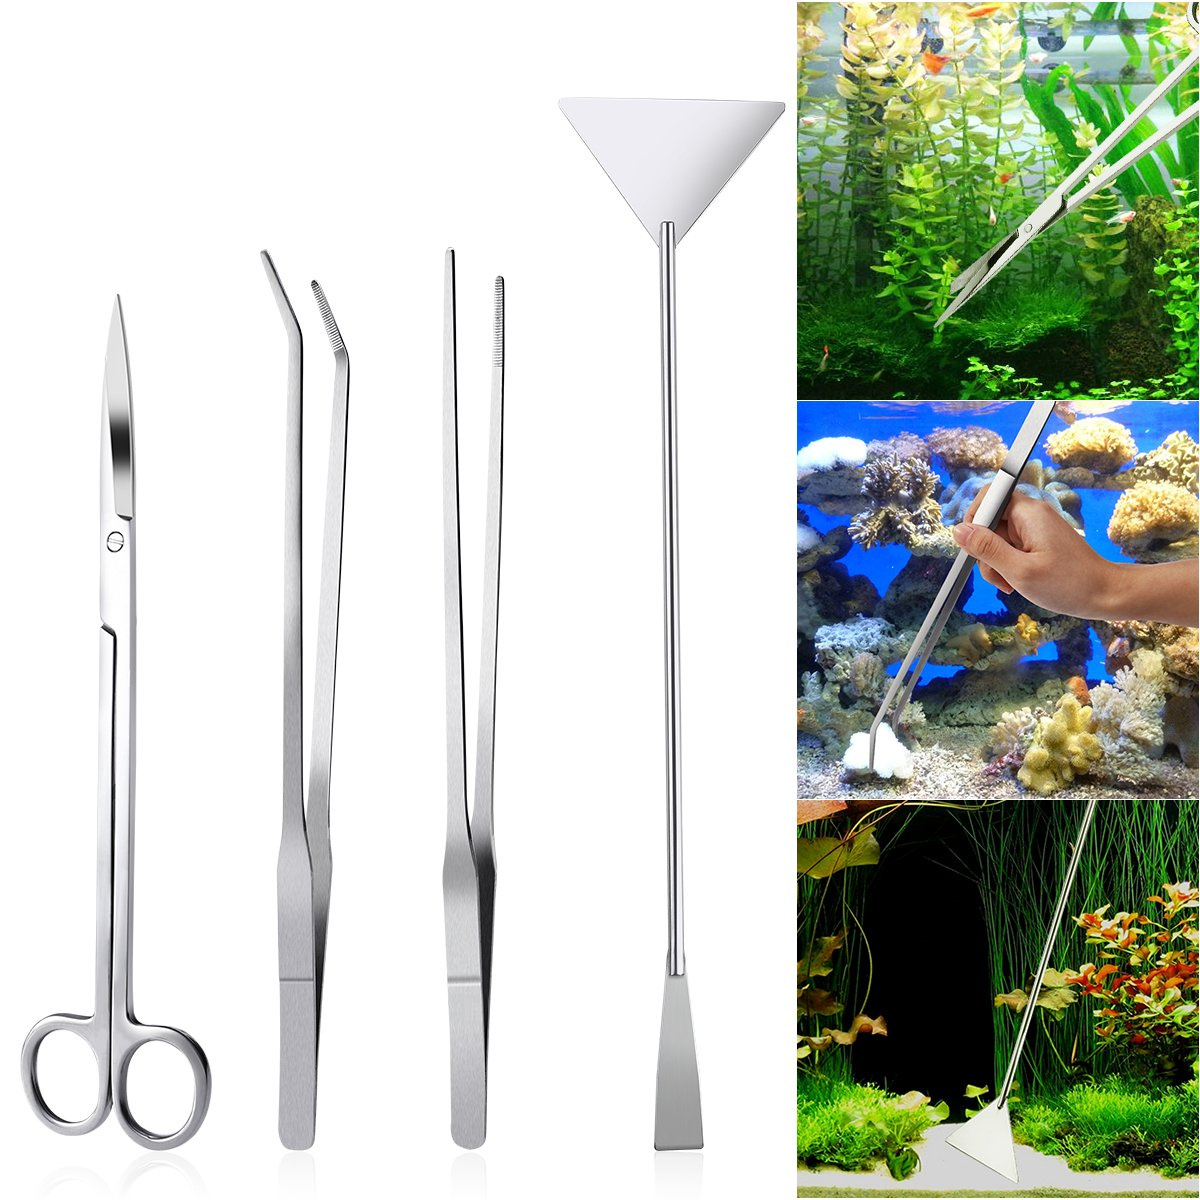 UEETEK 4PCS Acier inoxydable Aquarium Tank Aquatic Plant Tweezers and Scissors Spatula Tool Set